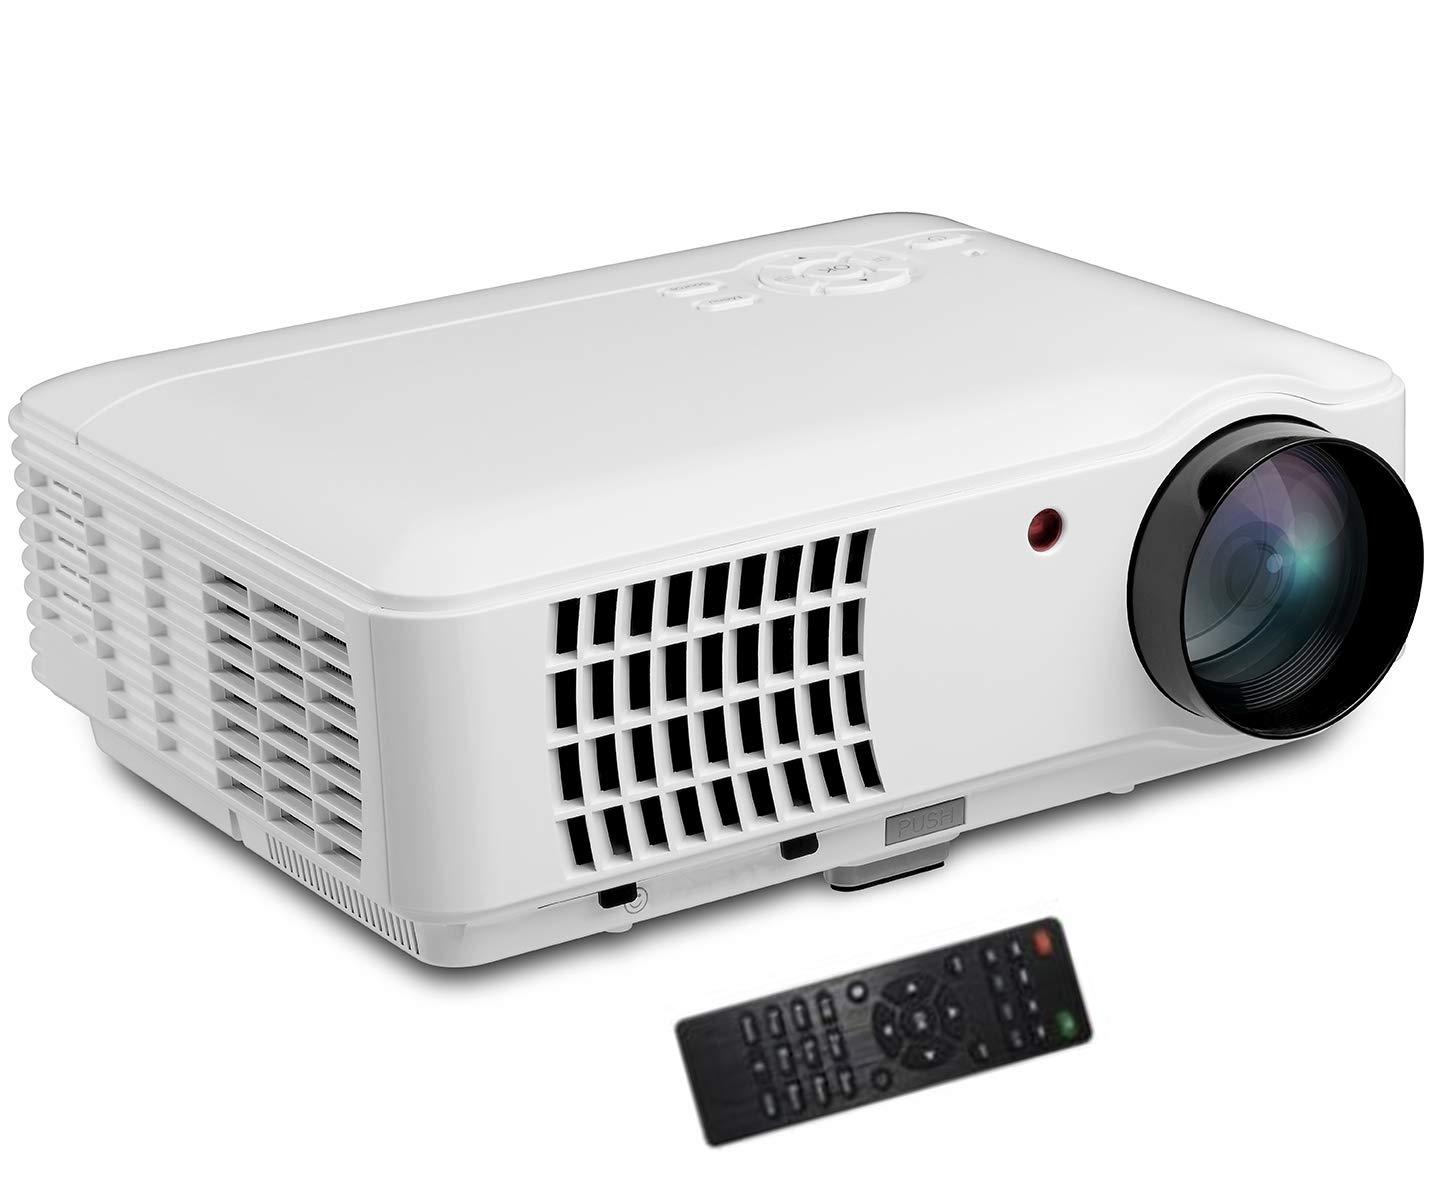 HDプロジェクター5.8インチLEDプロジェクターポータブルホーム2500ルーメンサポート1080P互換MOV VAI VC1 FLV RMVB MPEG MJPEGおよび他のフォーマット B07P9PVB9F